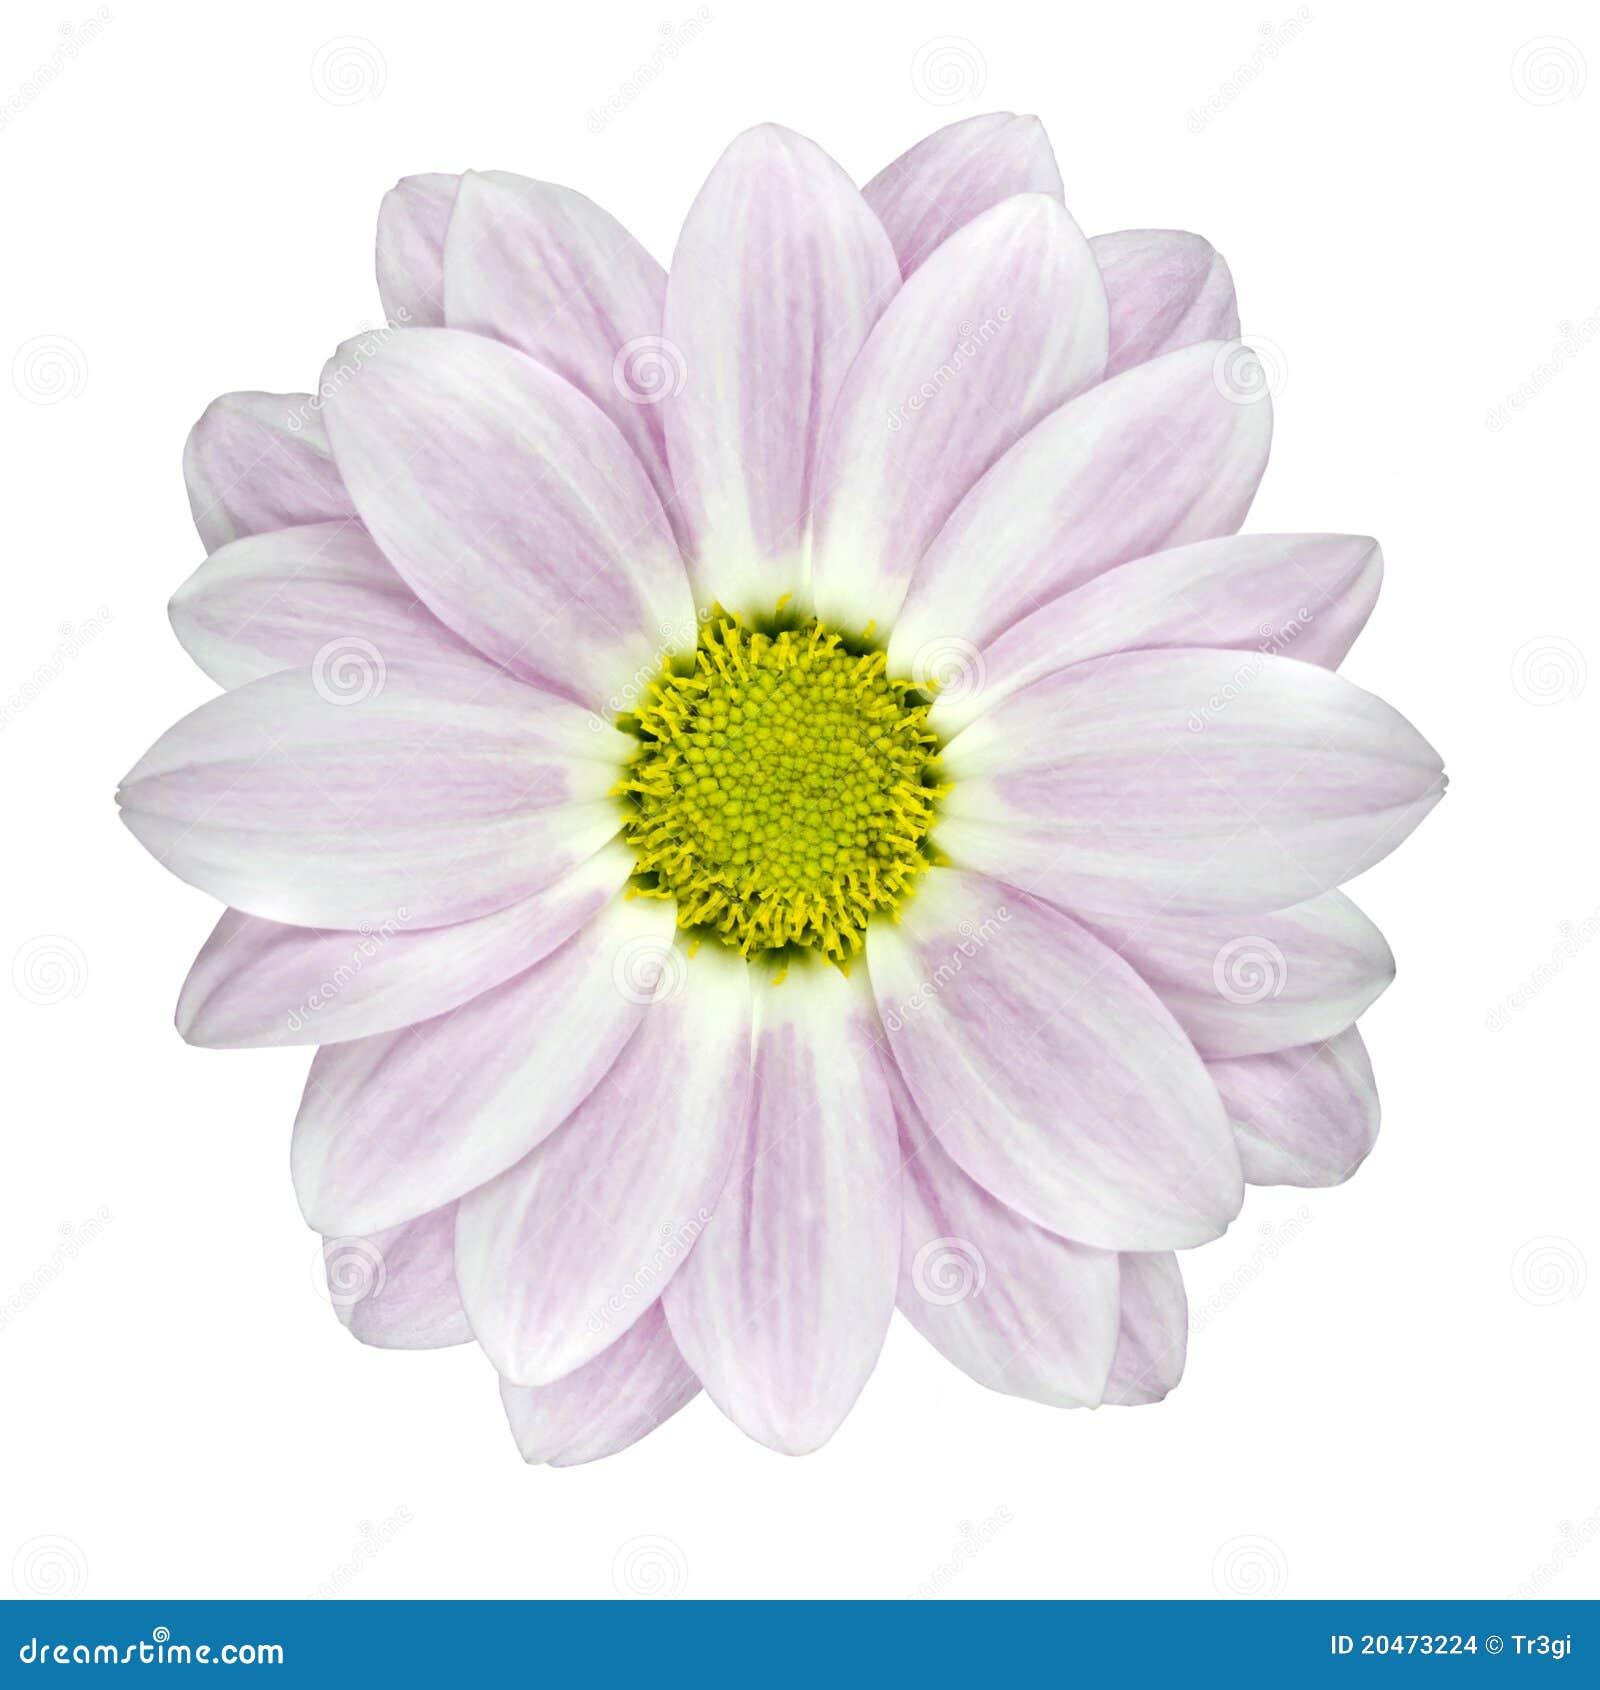 Single pink and white dahlia flower isolated stock photo image of single pink and white dahlia flower isolated mightylinksfo